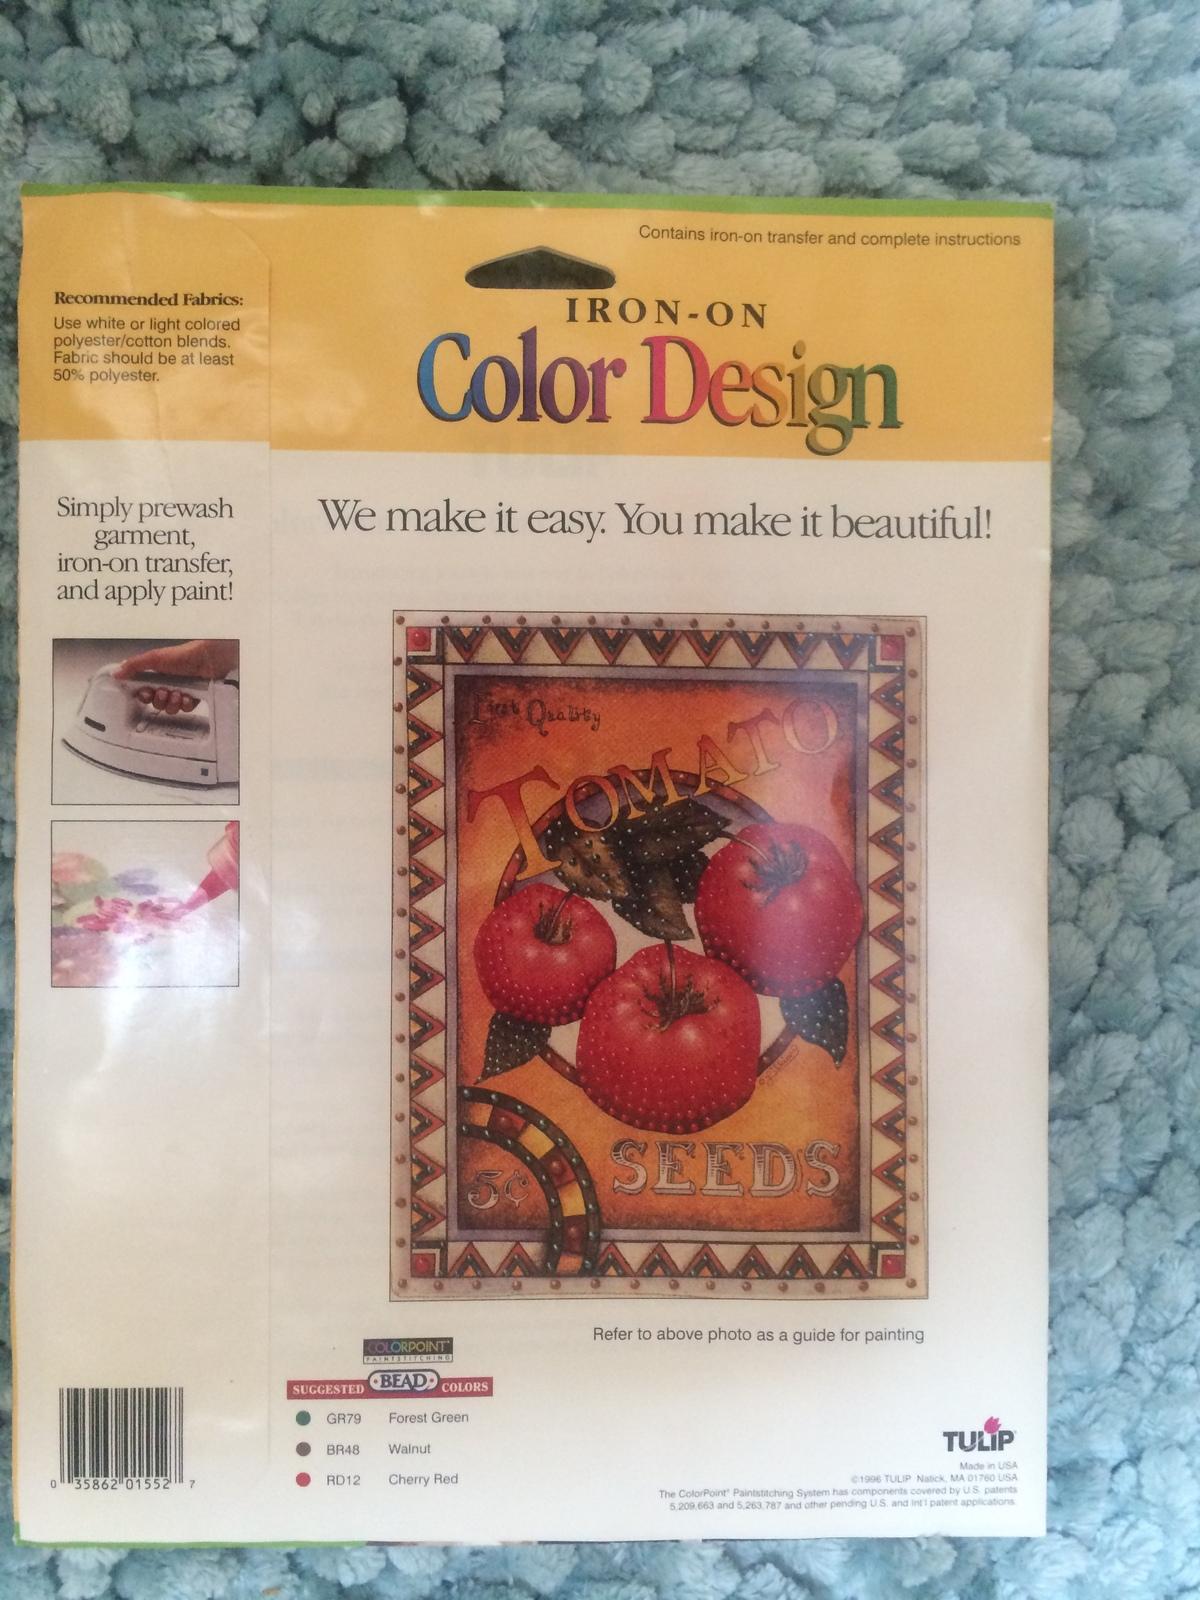 Tulip brand Iron on transfers  -  CCT44 Tomato Seeds  by Lillian Egleston 1996